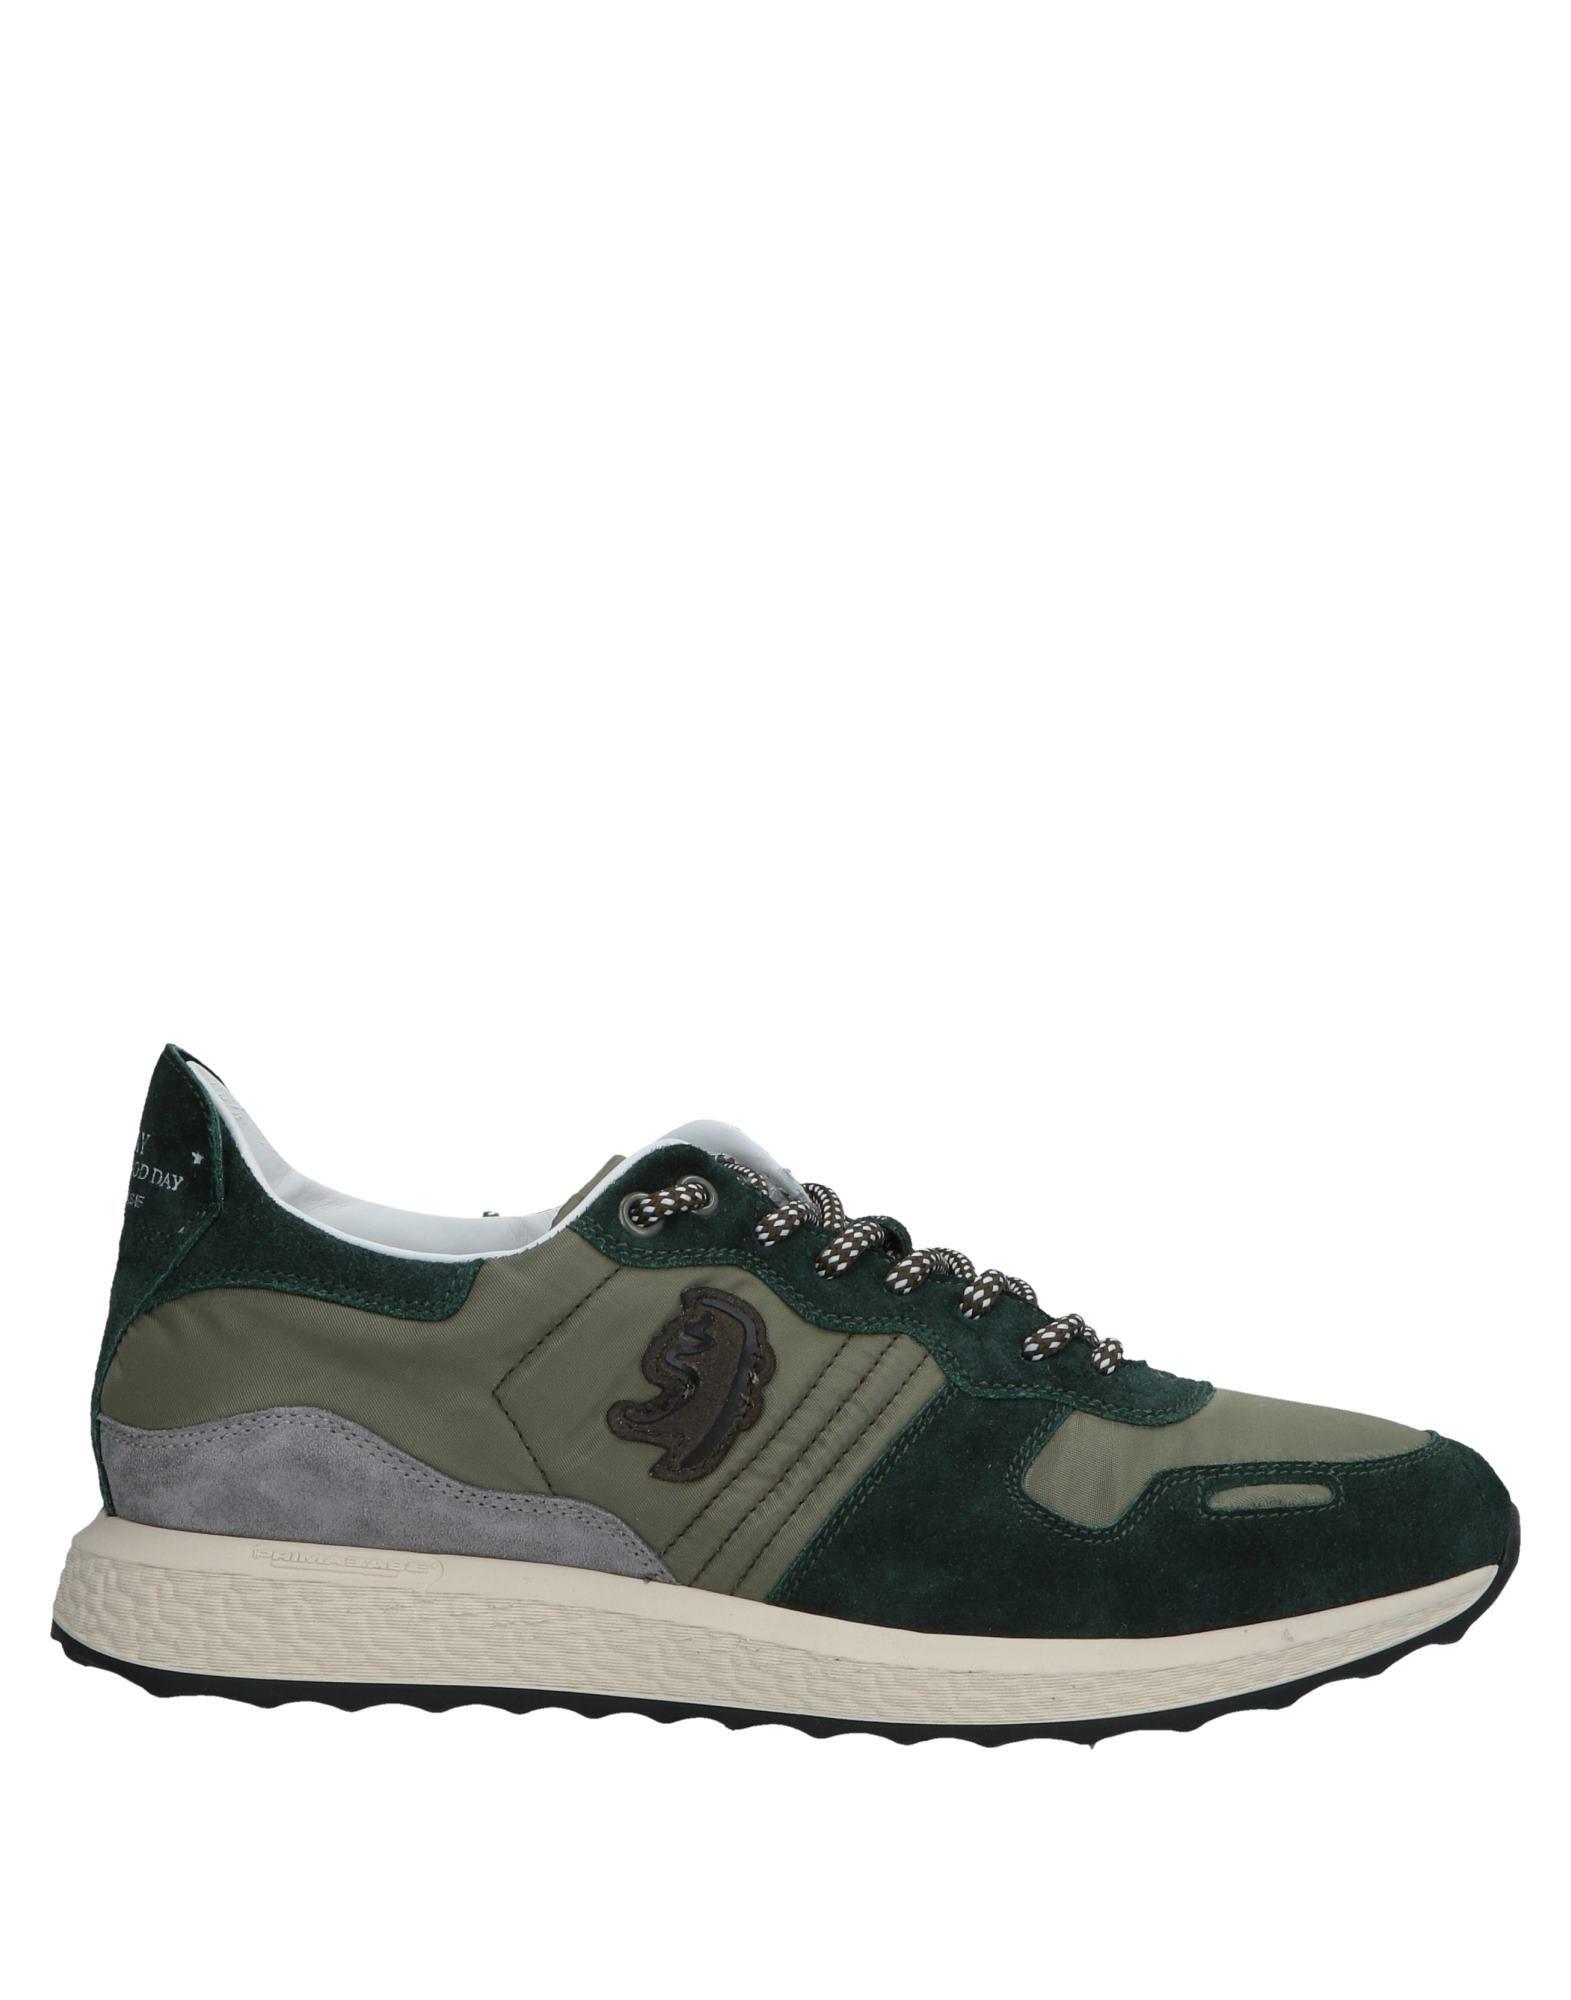 Primabase Sneakers online - Men Primabase Sneakers online Sneakers on  Australia - 11579846VV e841b5